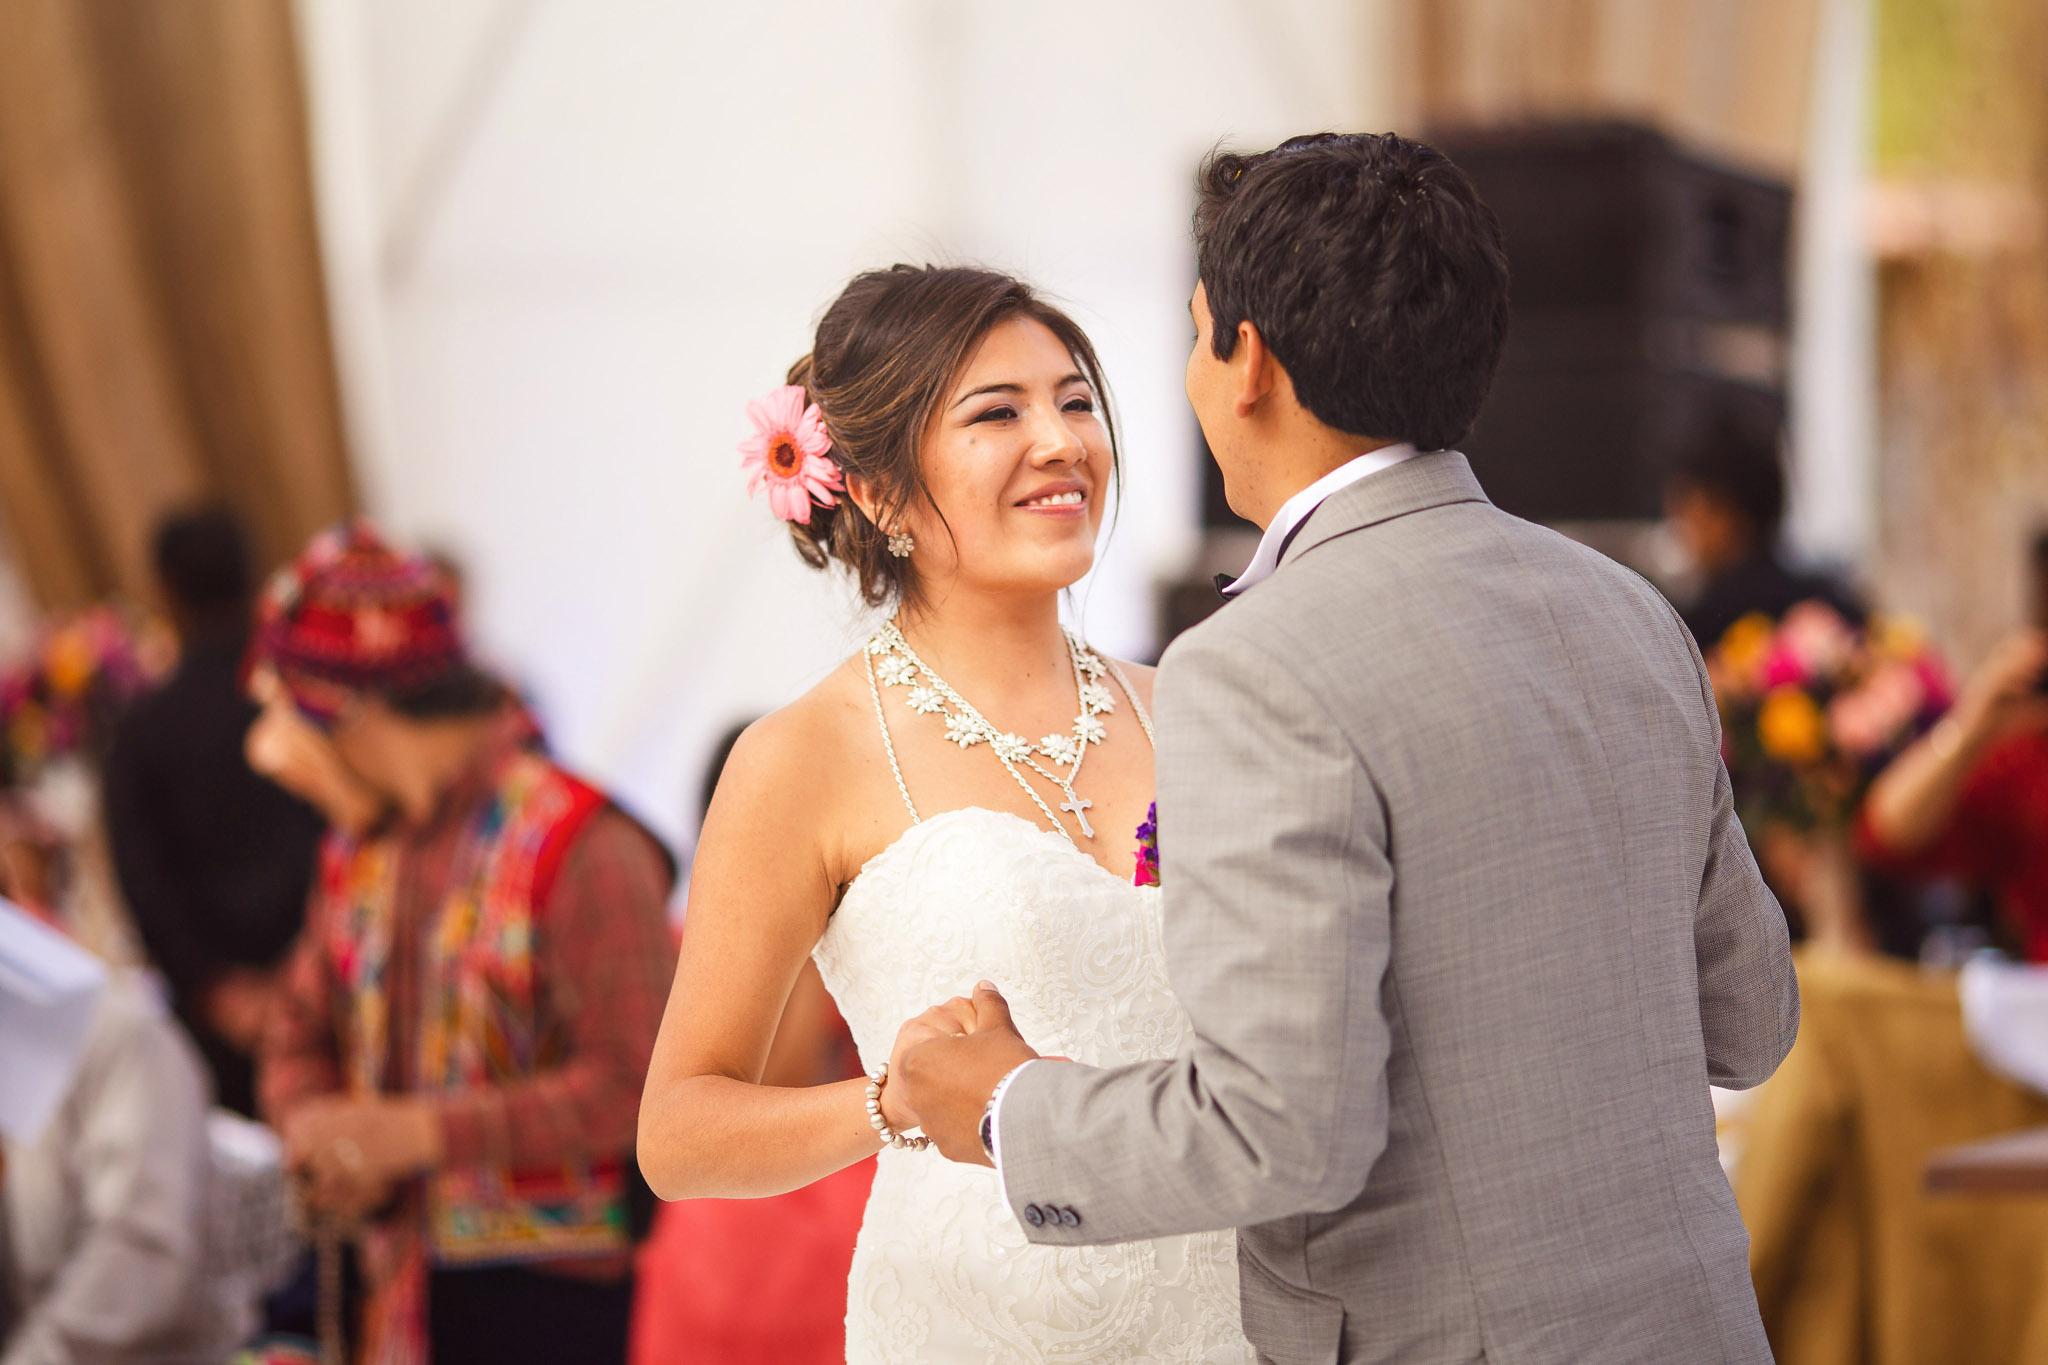 Wedding-Travellers-Destination-Wedding-Peru-Cusco